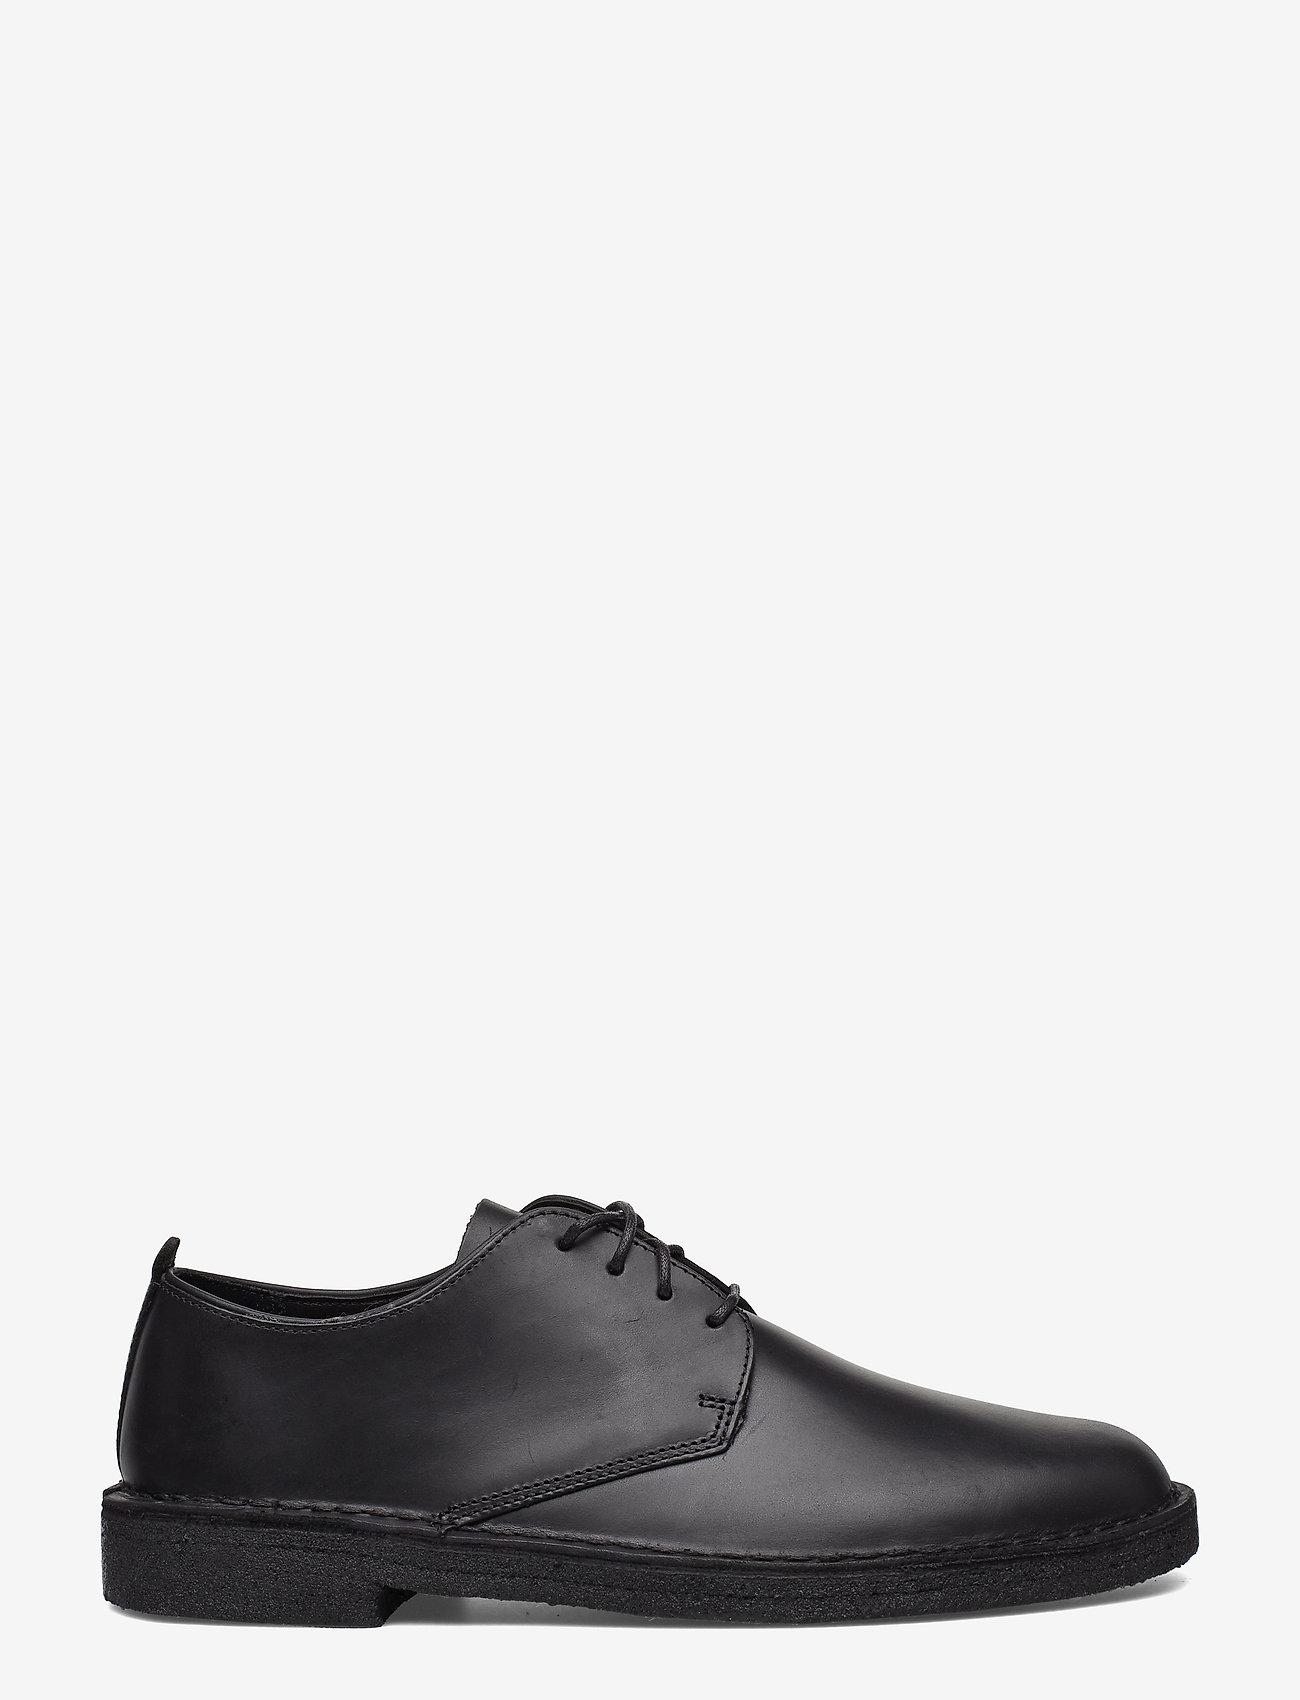 Clarks Originals - Desert London - snörskor - black leather - 1